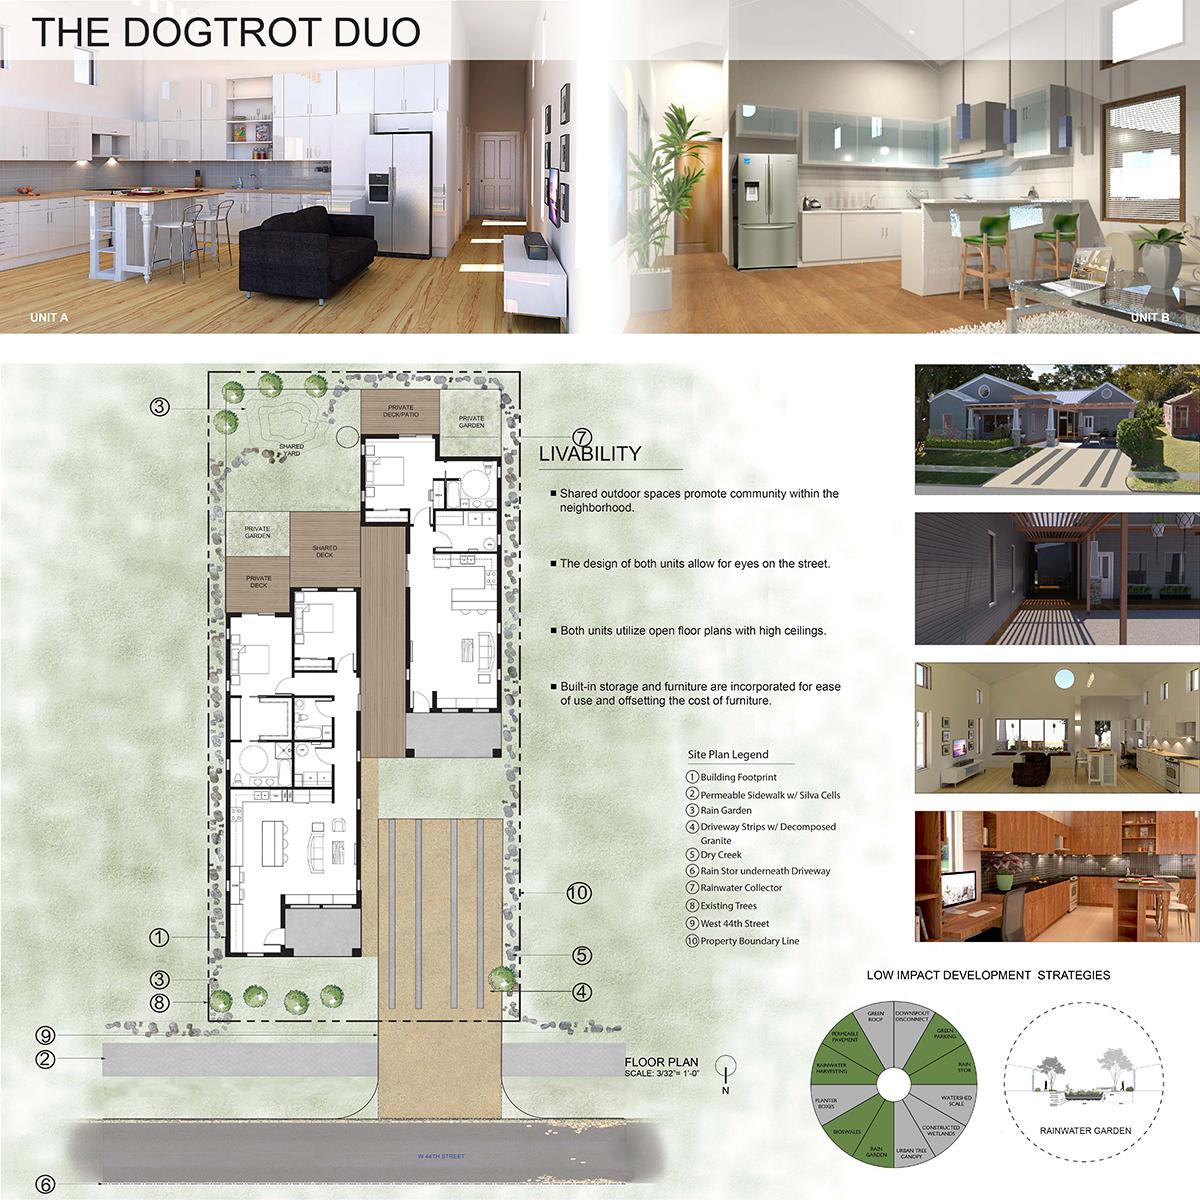 dogtrot_duo_-_livability.jpg